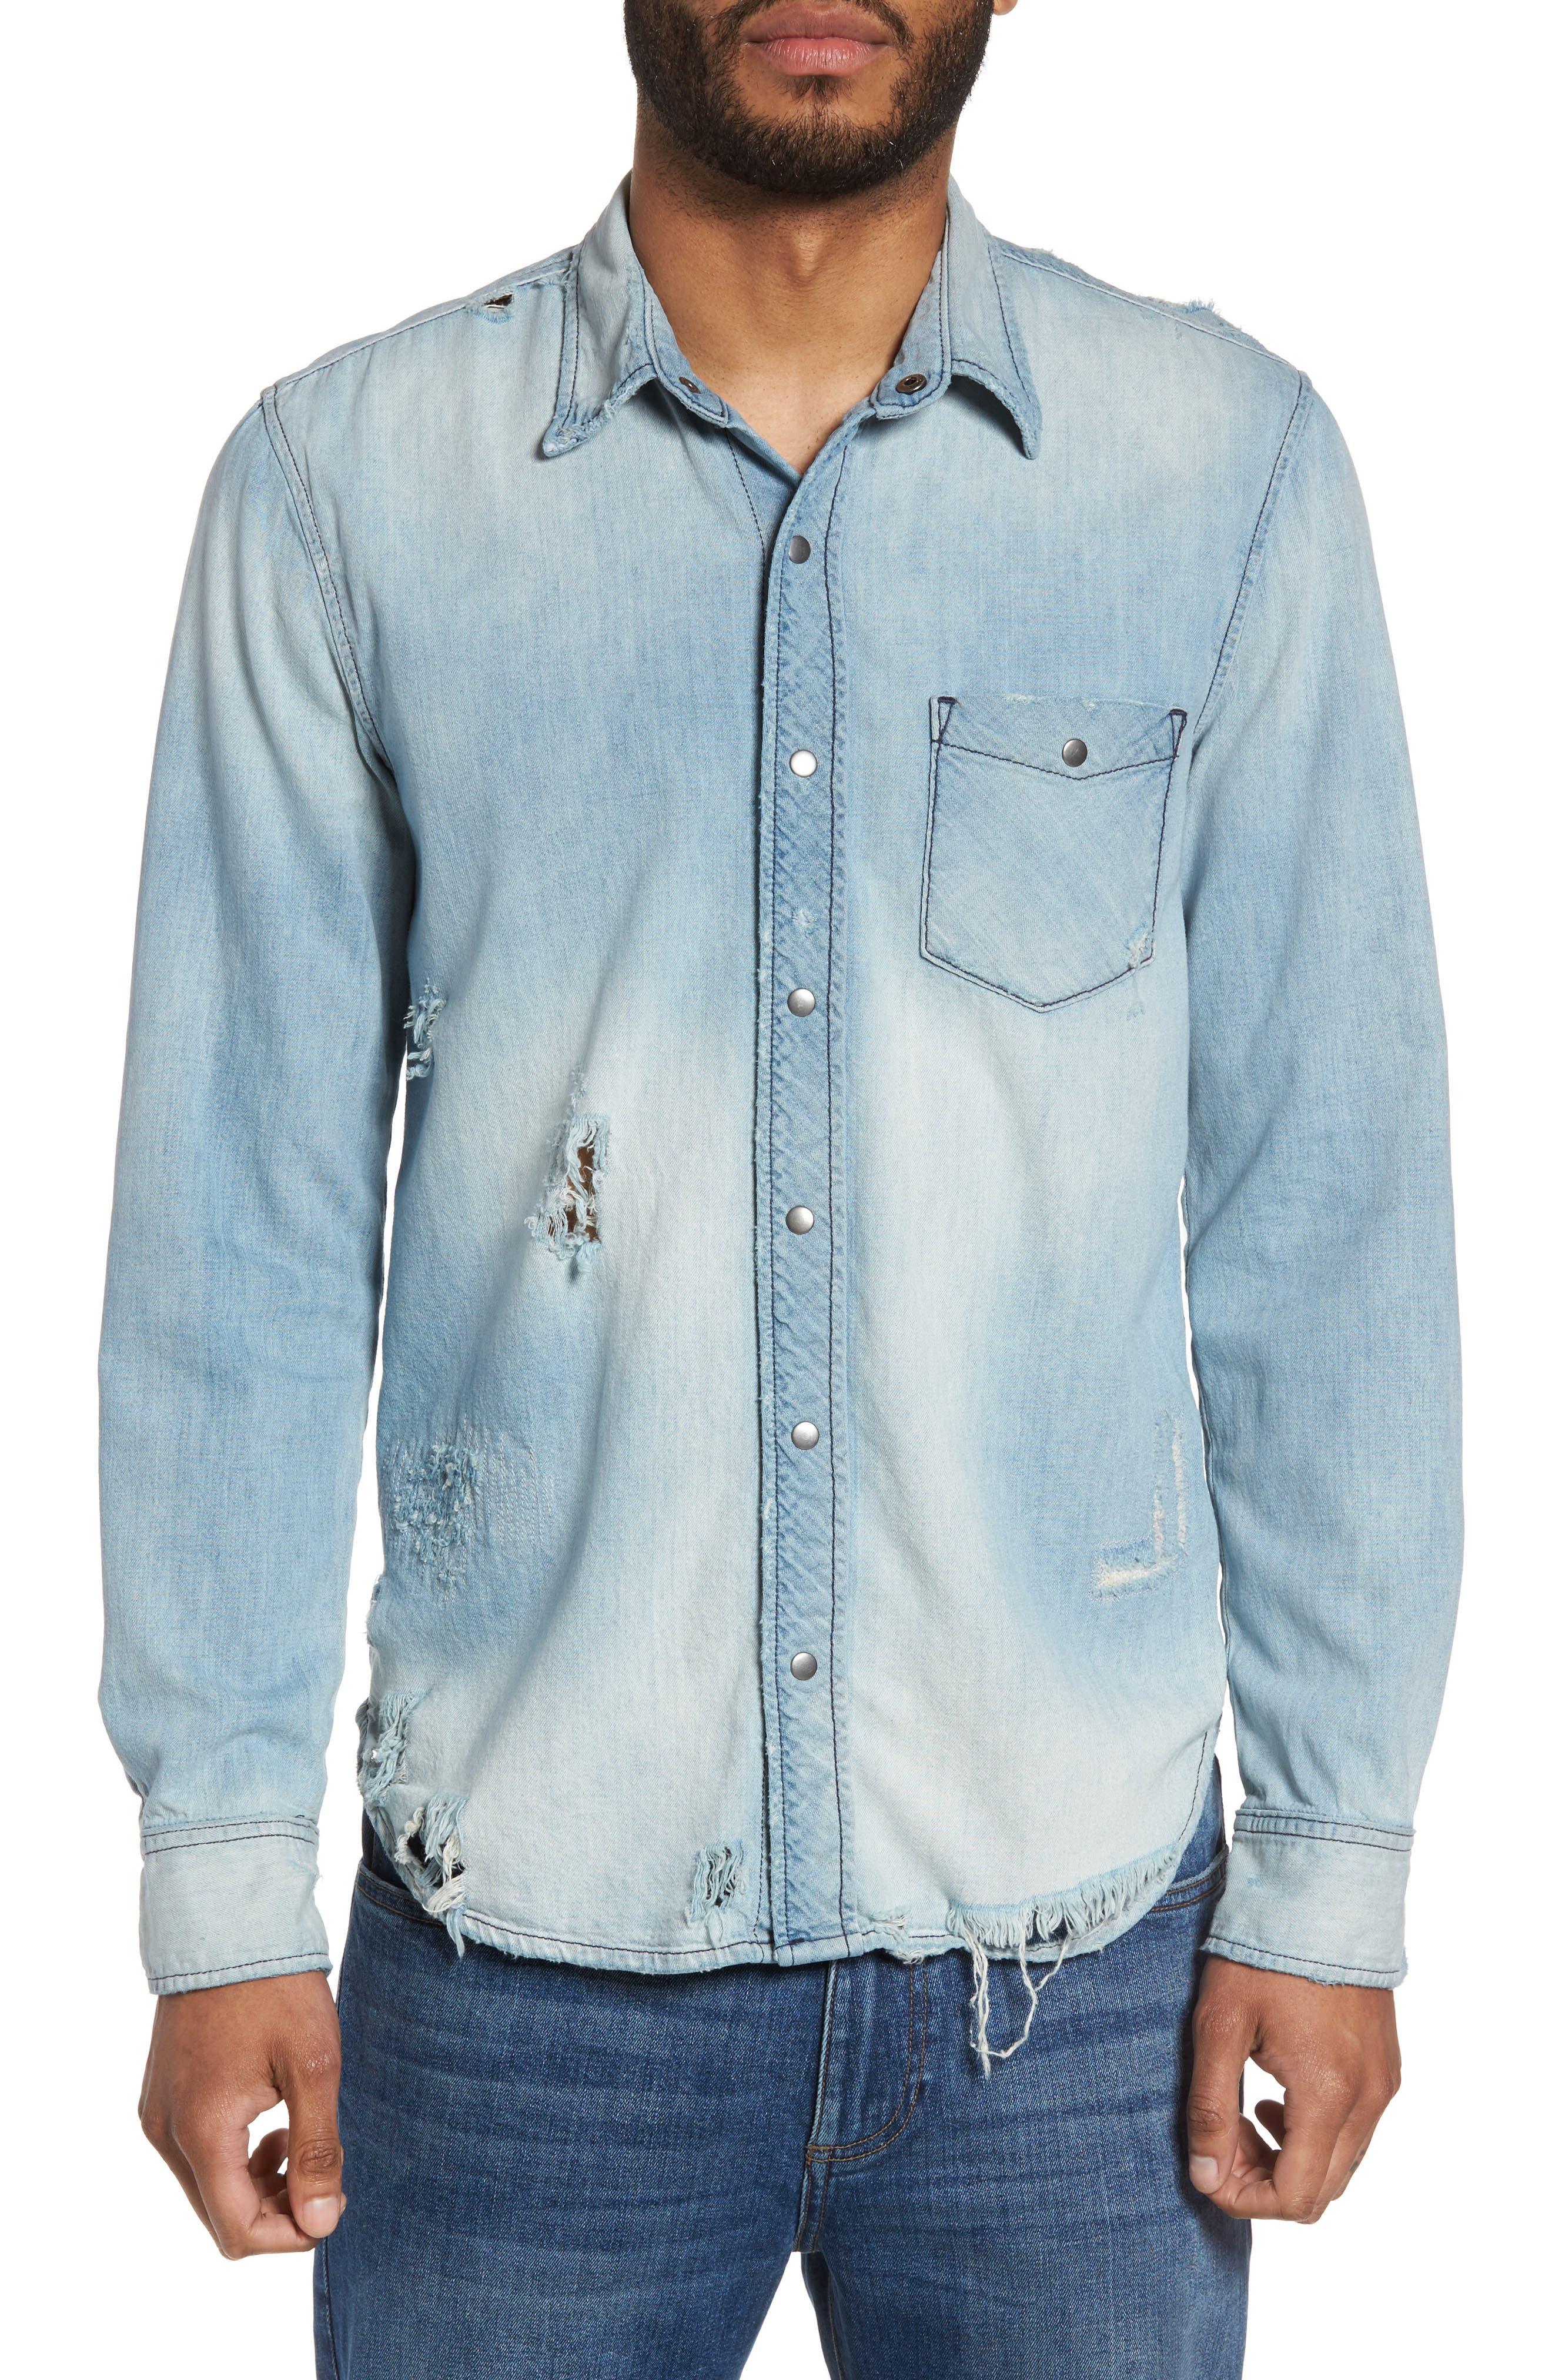 Hudson Weston Slim Fit Destructed Denim Shirt